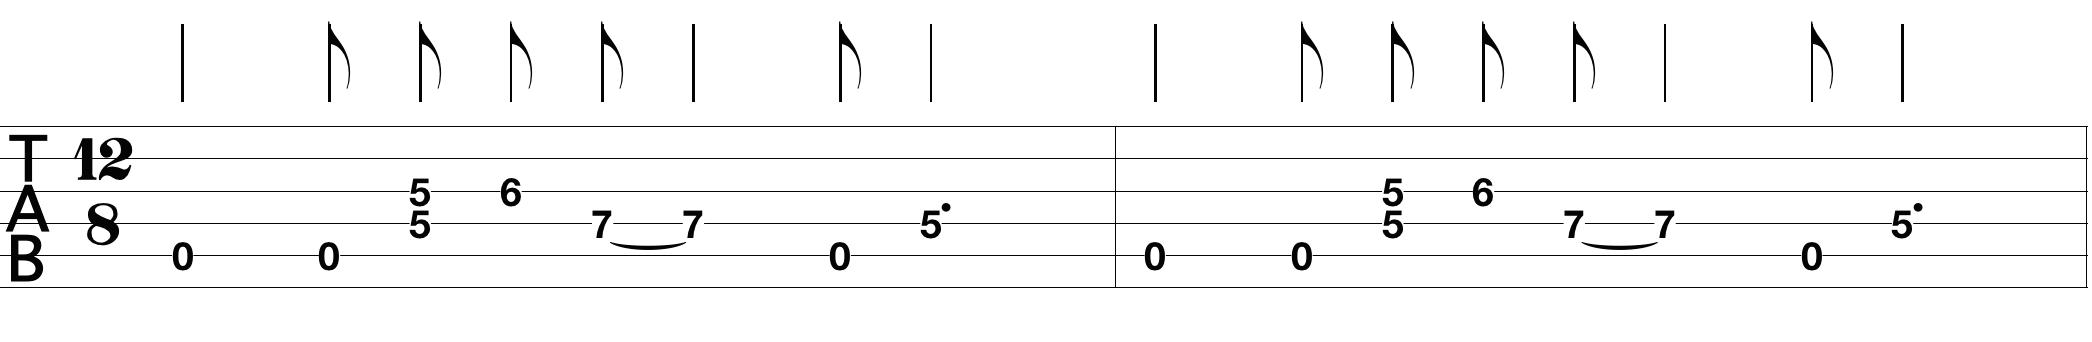 guitar-tabs-blues_1.png